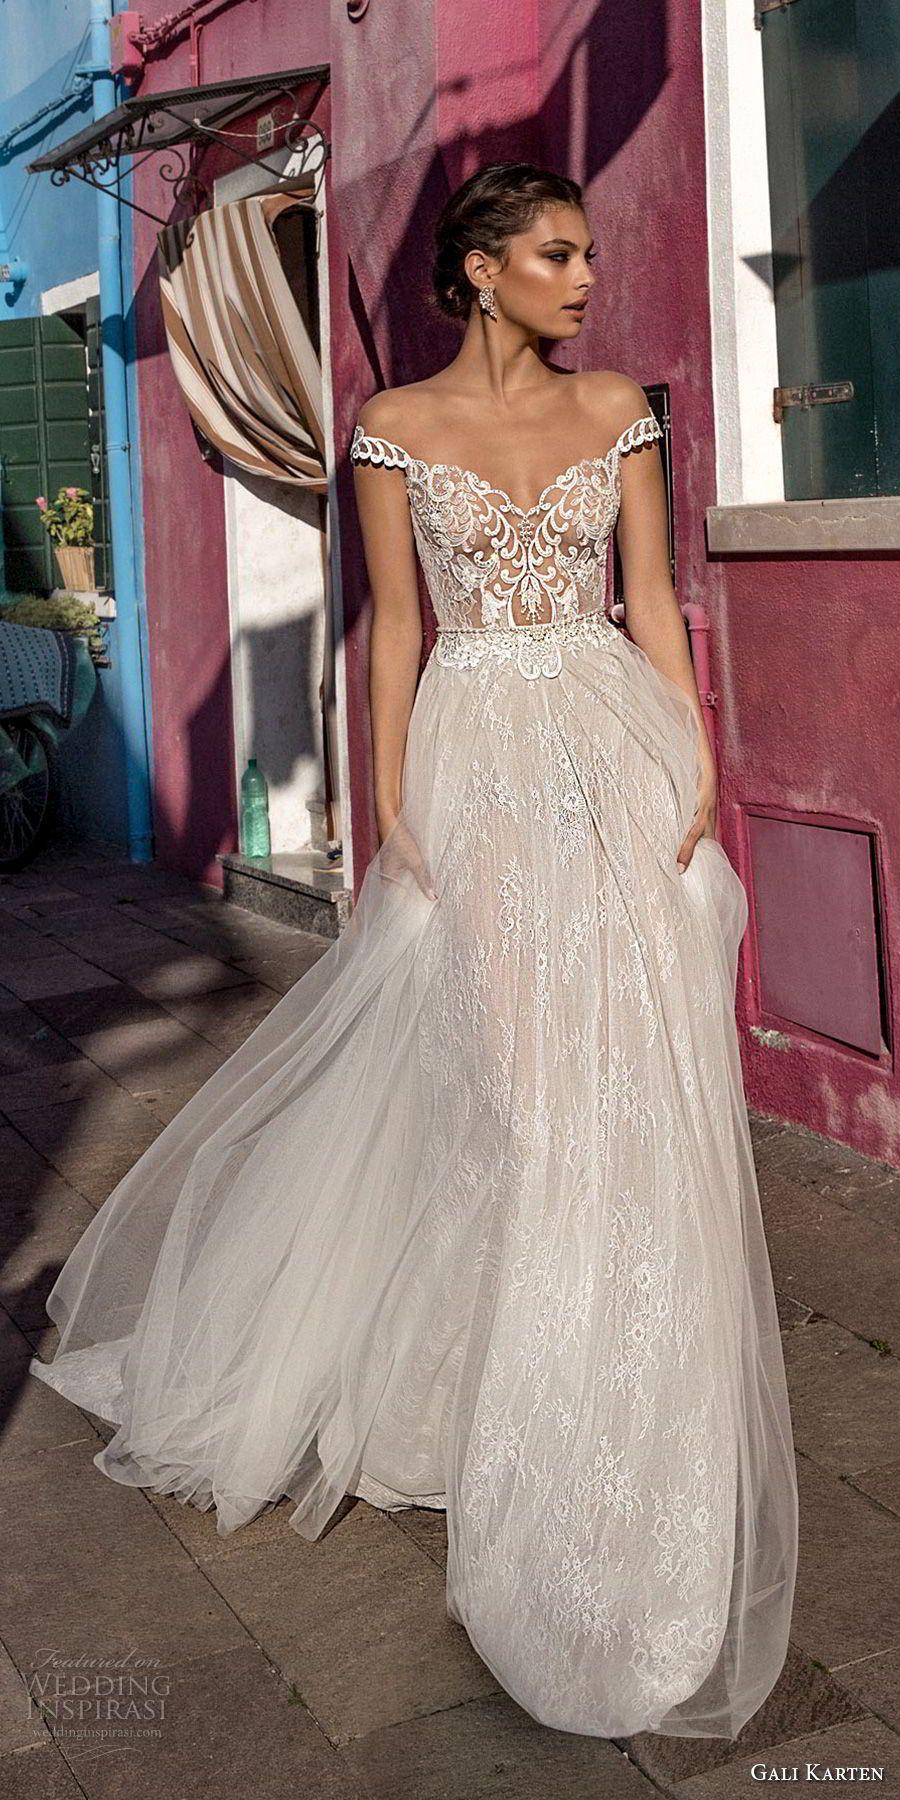 Gali Karten 2018 Wedding Dresses First Look At The Burano Bridal